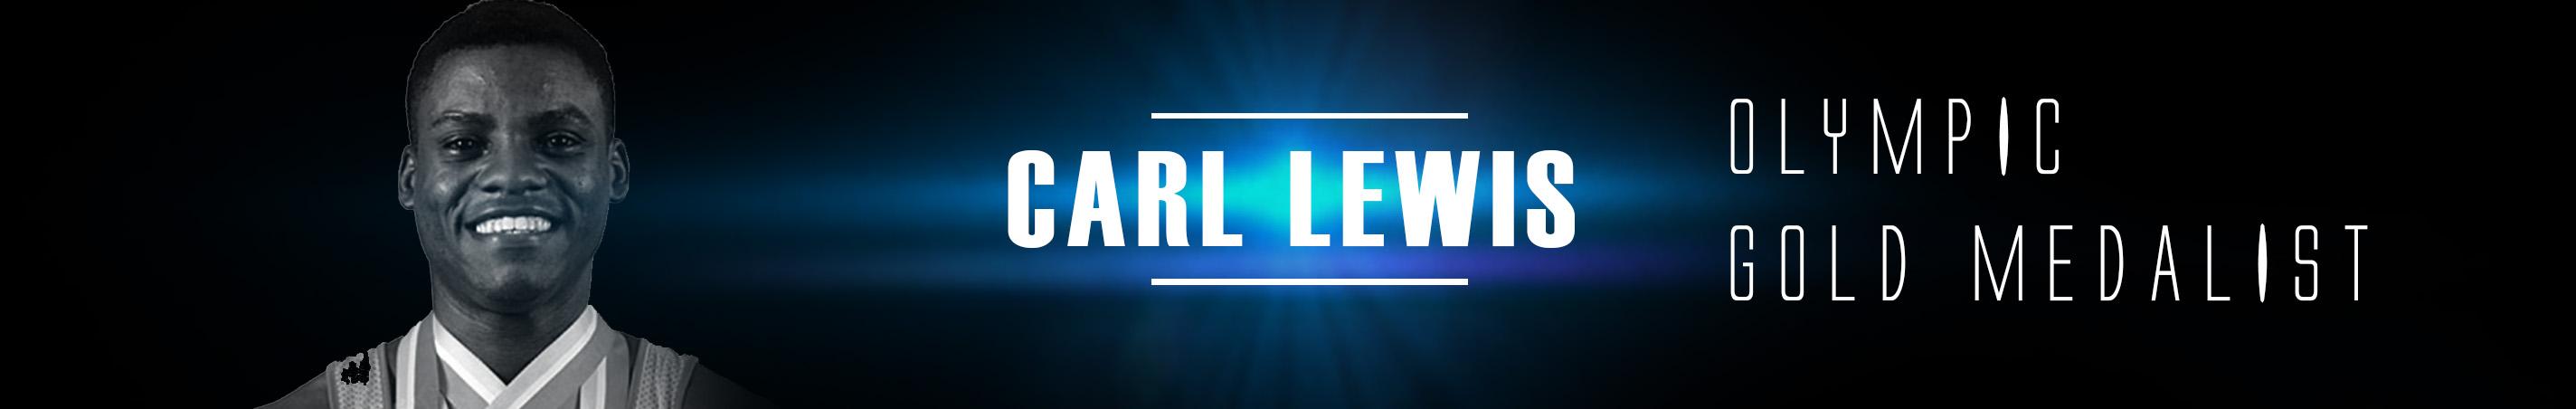 CELEB - CARL LEWIS